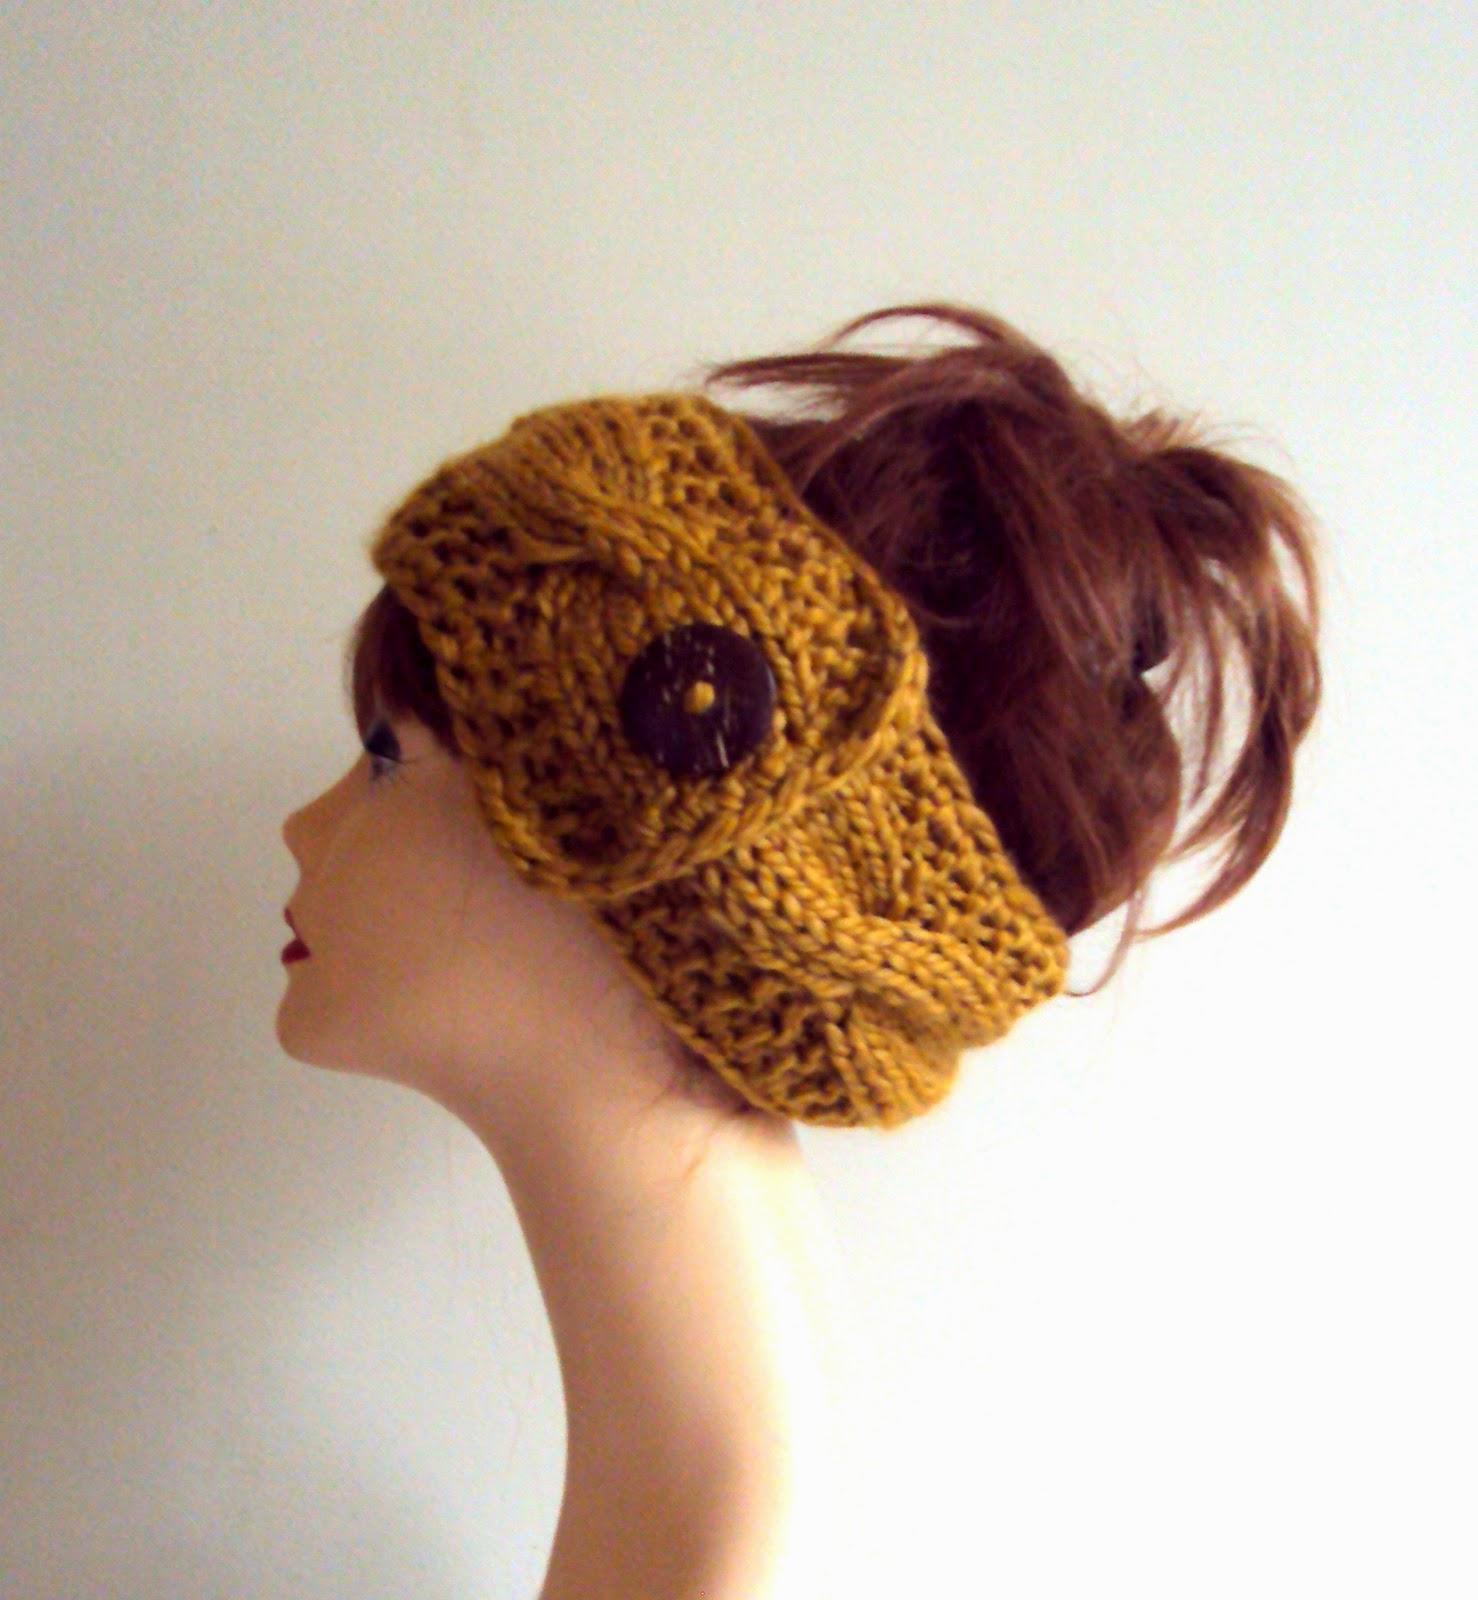 https://www.etsy.com/listing/204043855/sale-knit-earwarmer-headband-chunky-head?ref=shop_home_active_18&ga_search_query=Earwarmer